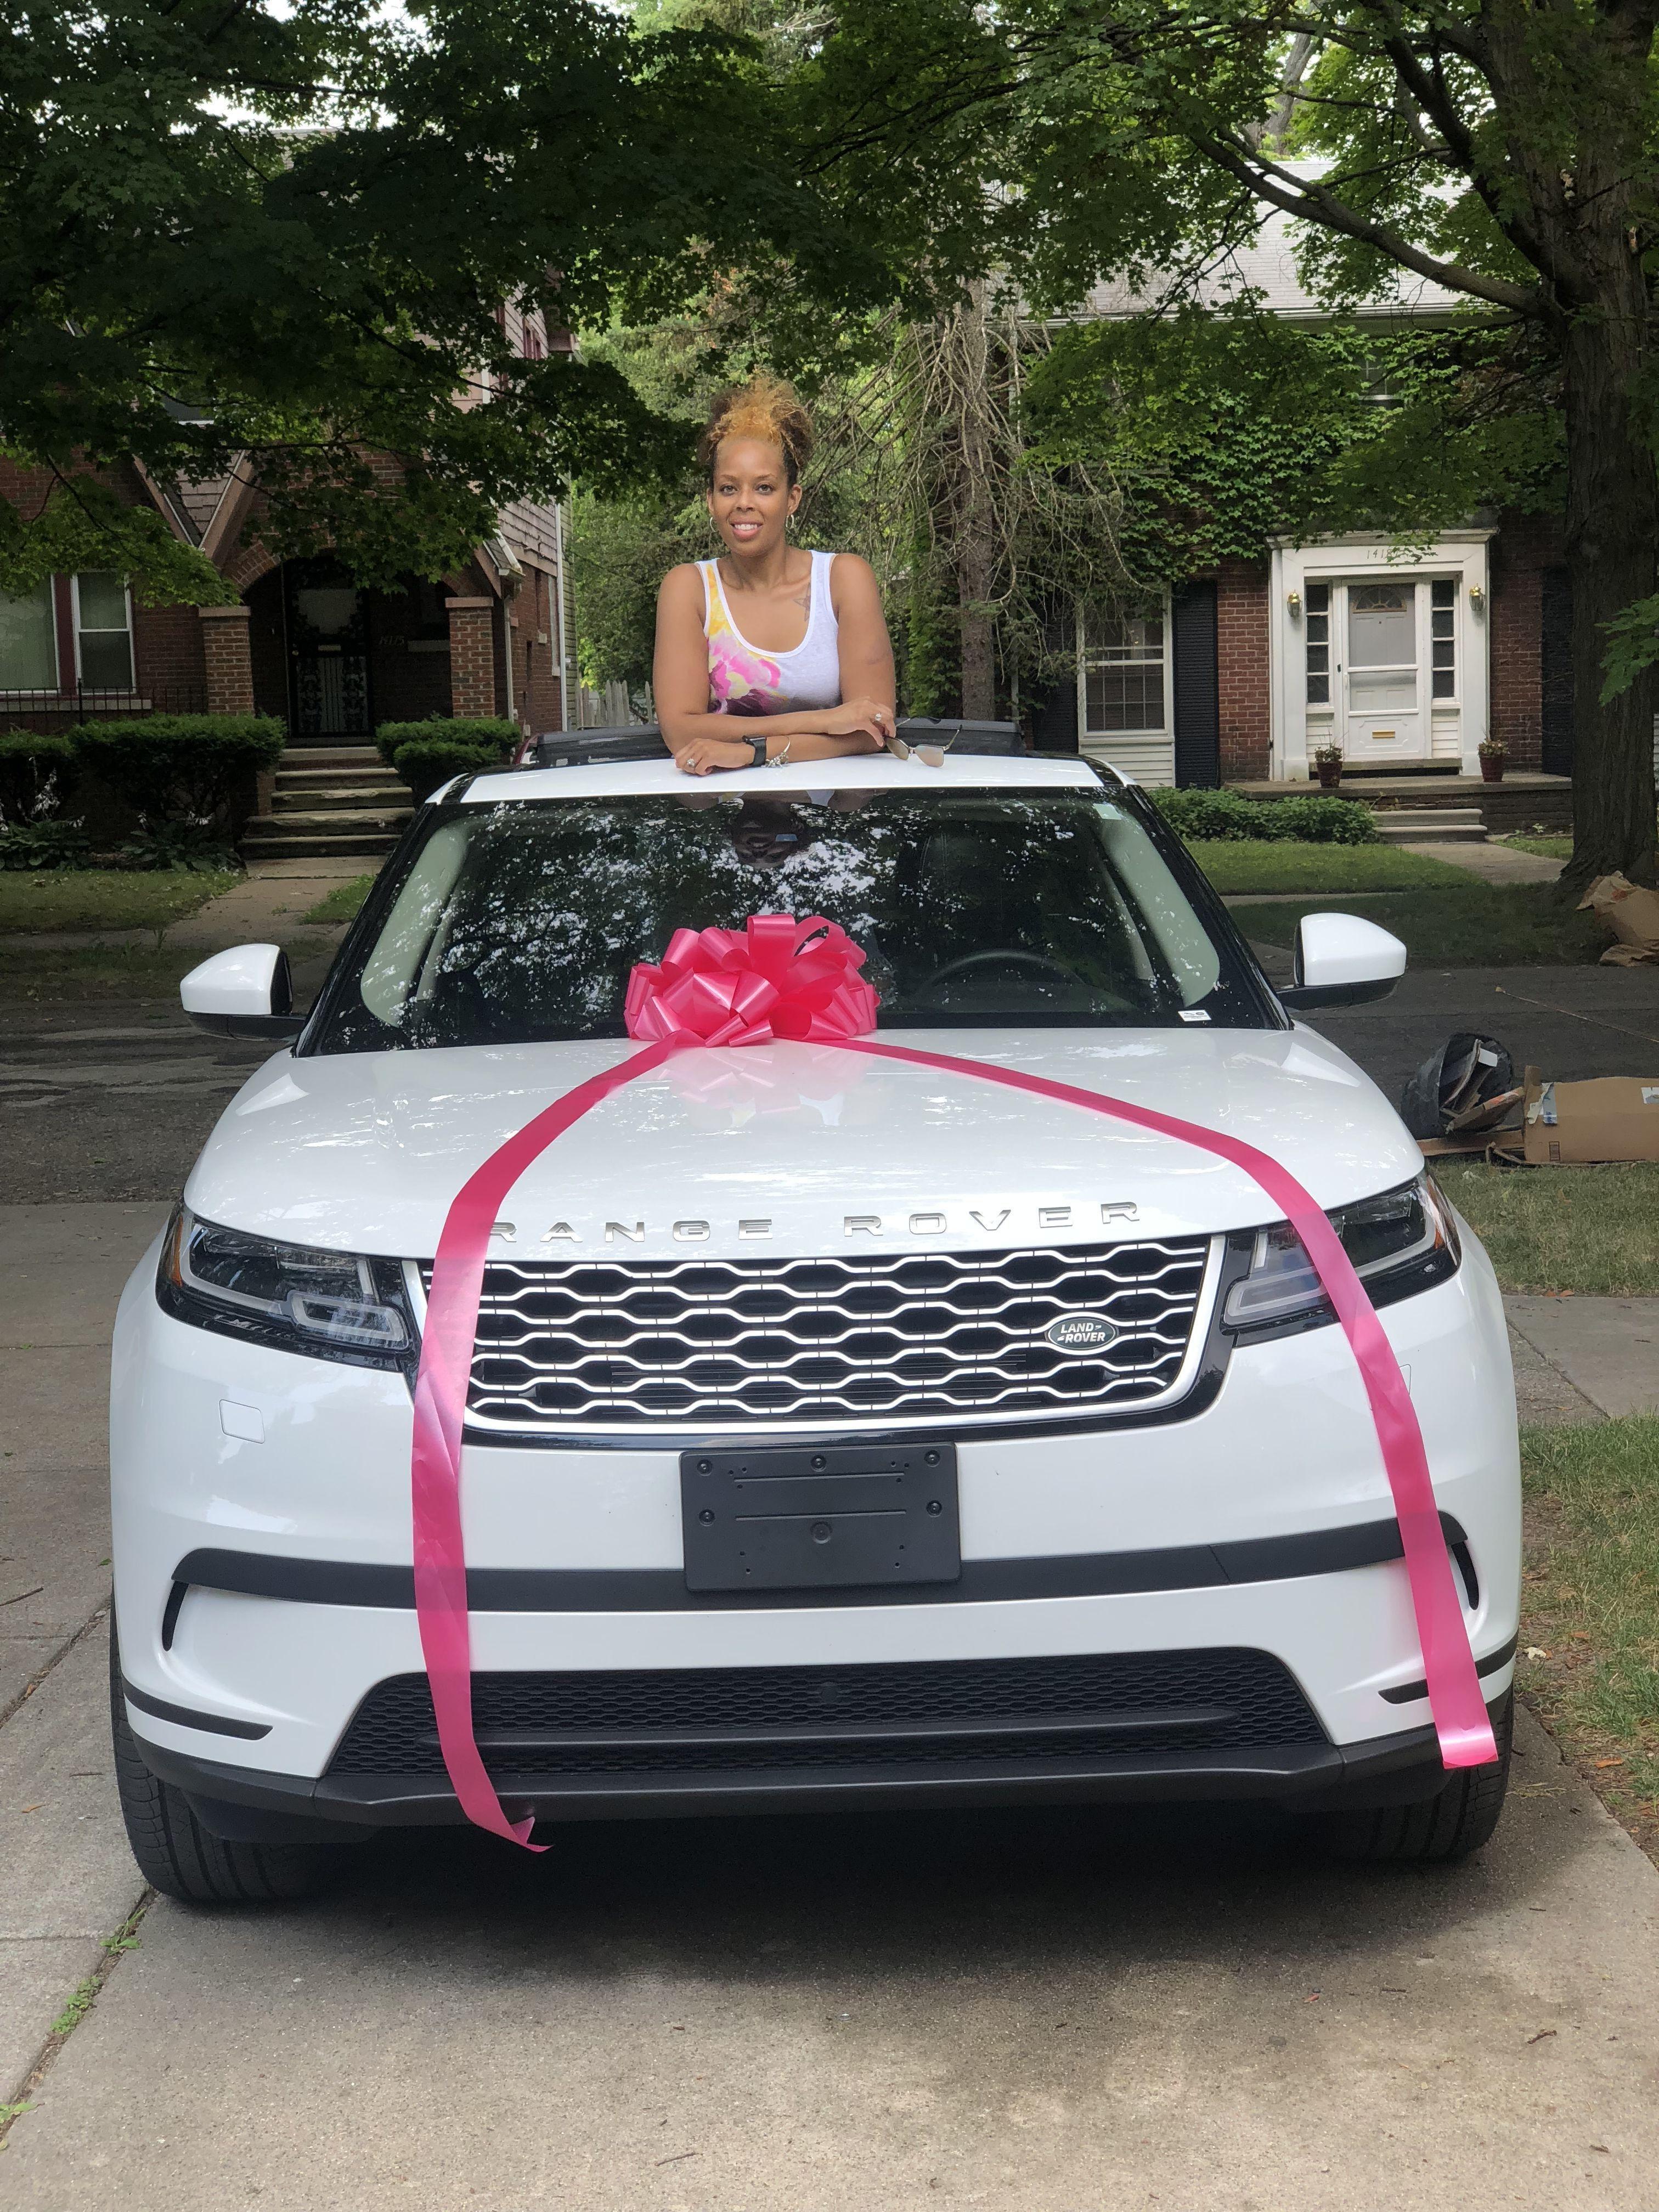 Range Rover, velar, LEO, Birthday, pink bow, Detroit #pinkrangerovers Range Rover, velar, LEO, Birthday, pink bow, Detroit #pinkrangerovers Range Rover, velar, LEO, Birthday, pink bow, Detroit #pinkrangerovers Range Rover, velar, LEO, Birthday, pink bow, Detroit #pinkrangerovers Range Rover, velar, LEO, Birthday, pink bow, Detroit #pinkrangerovers Range Rover, velar, LEO, Birthday, pink bow, Detroit #pinkrangerovers Range Rover, velar, LEO, Birthday, pink bow, Detroit #pinkrangerovers Range Rove #pinkrangerovers